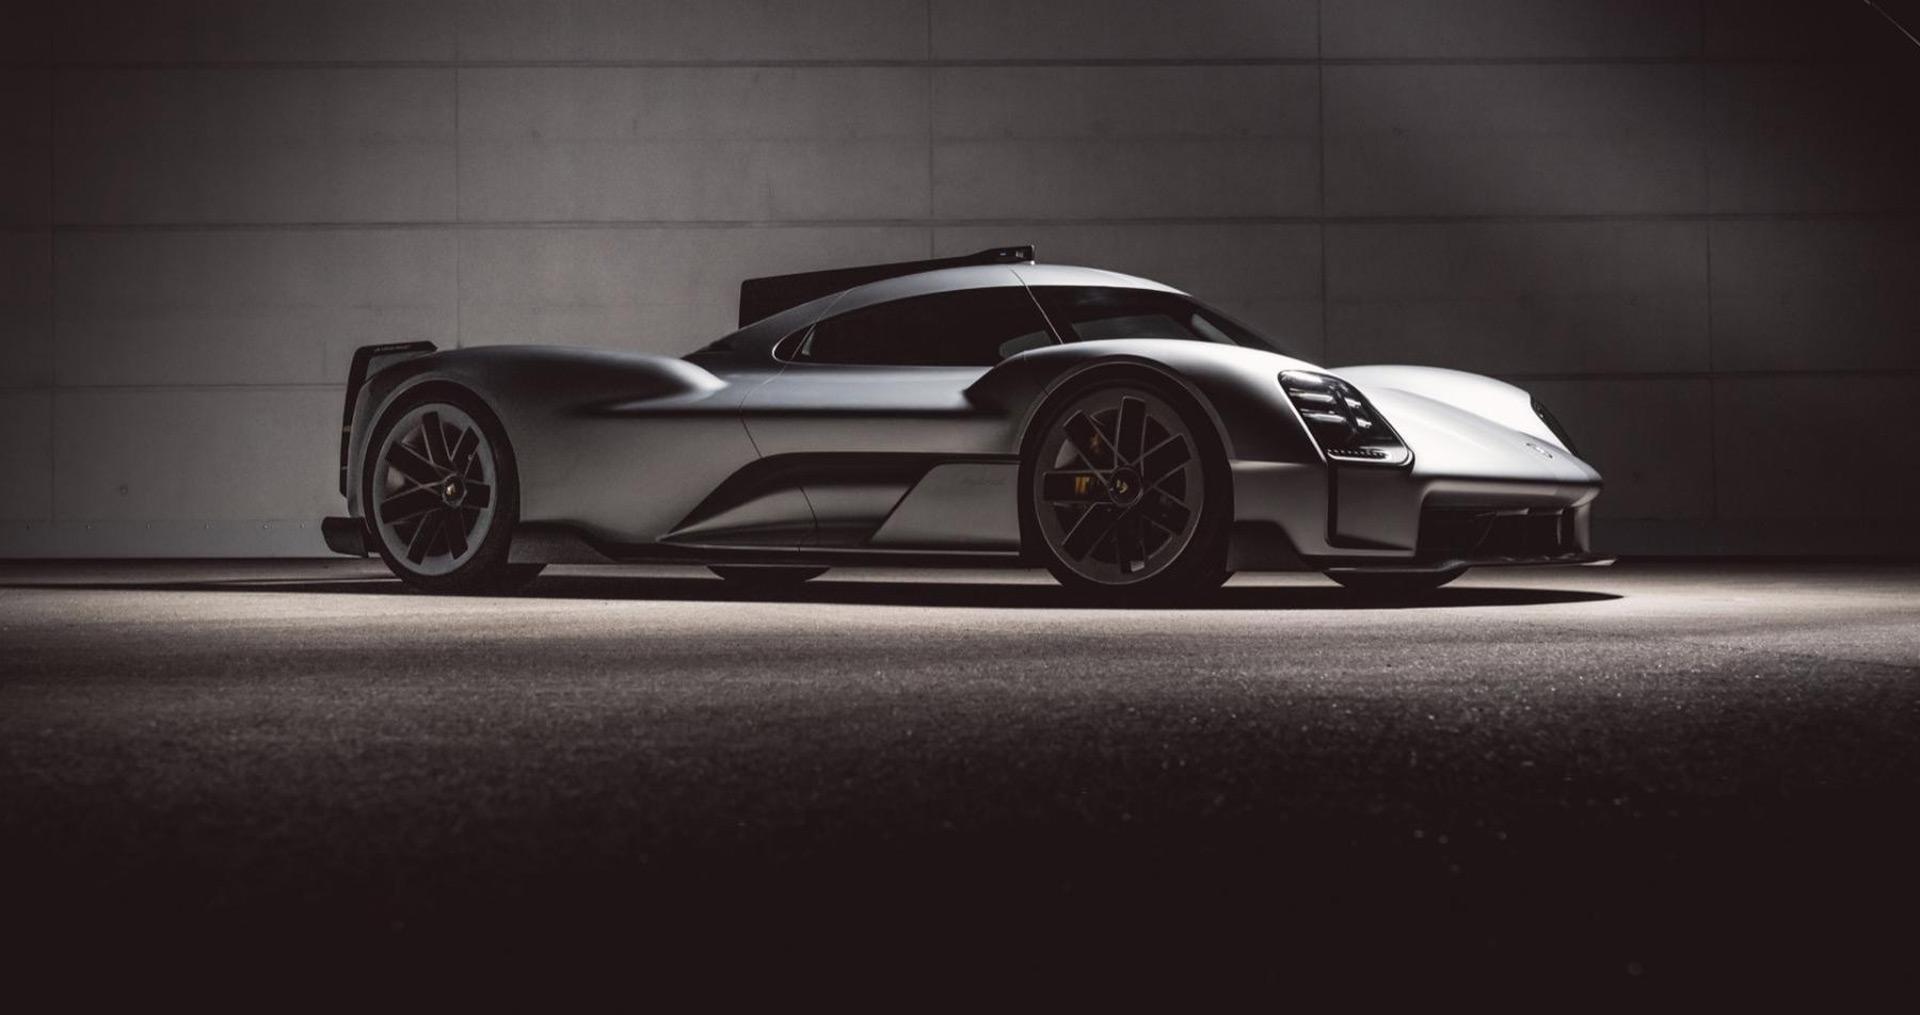 Porsche reveals secret concepts, including road-going 919 hypercar